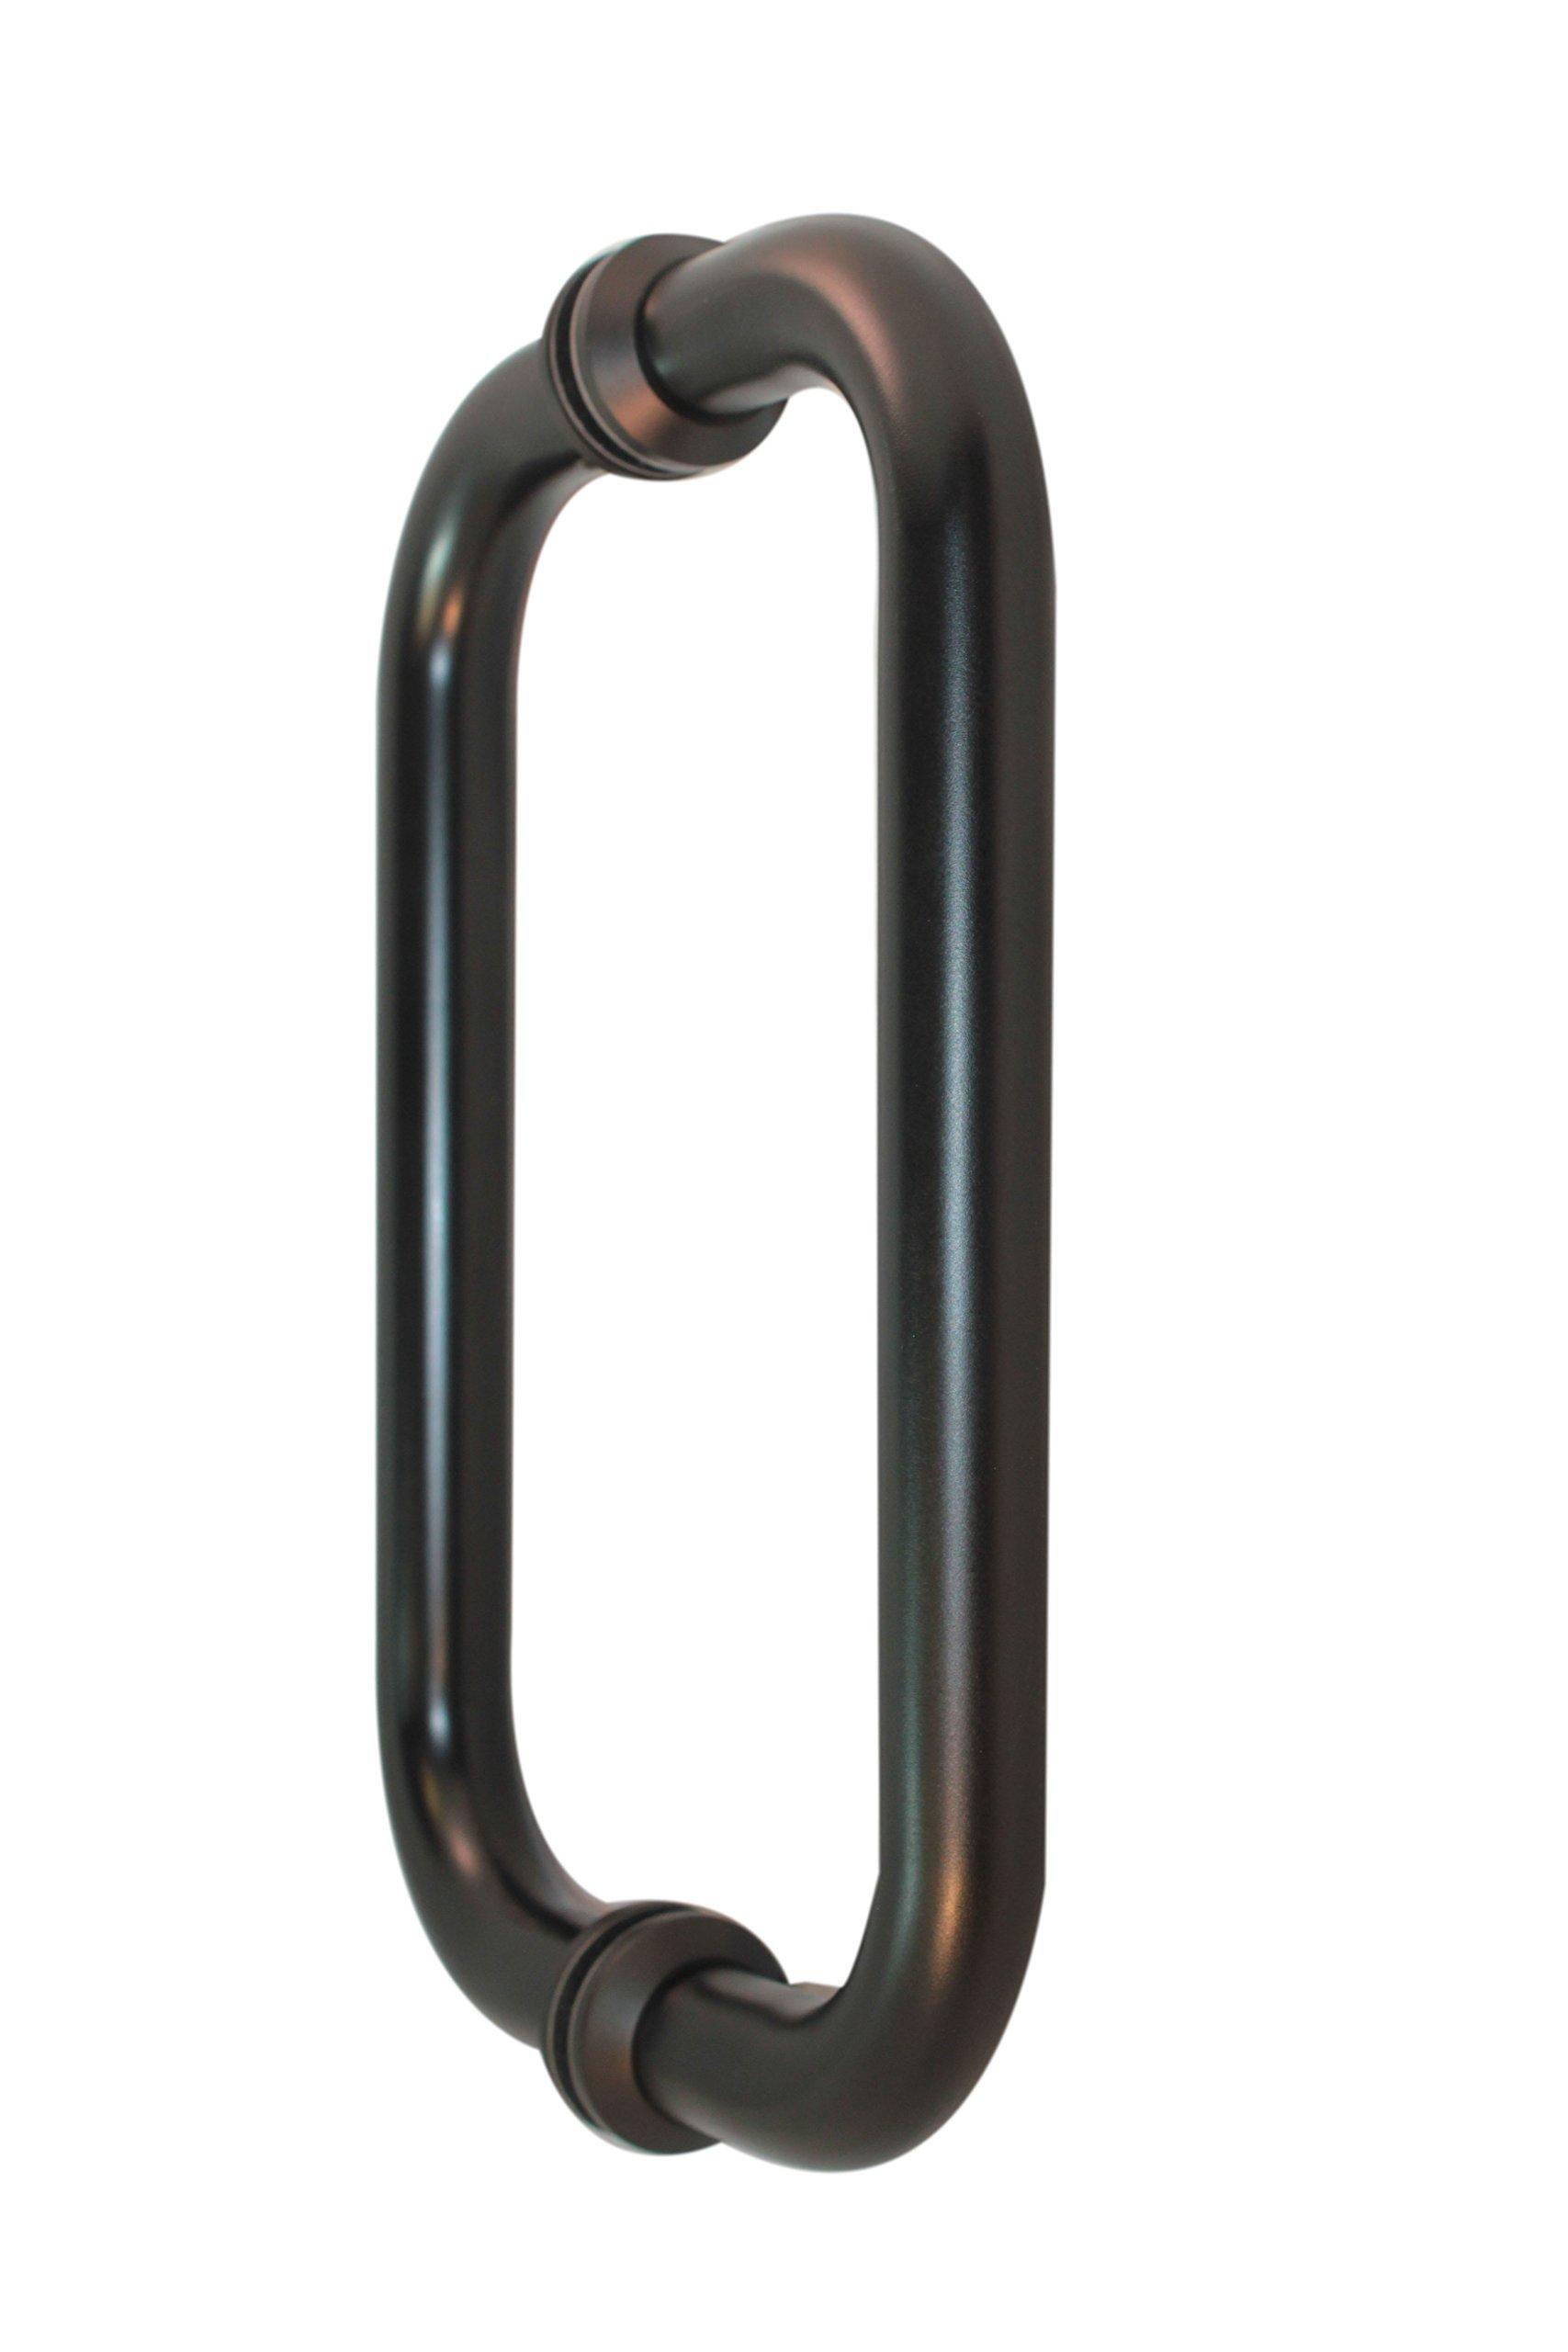 WBS 'Napa' - Heavy Duty / Heavy Glass Shower Door Handle Set Back-to-Back (Oil Rubbed Bronze)